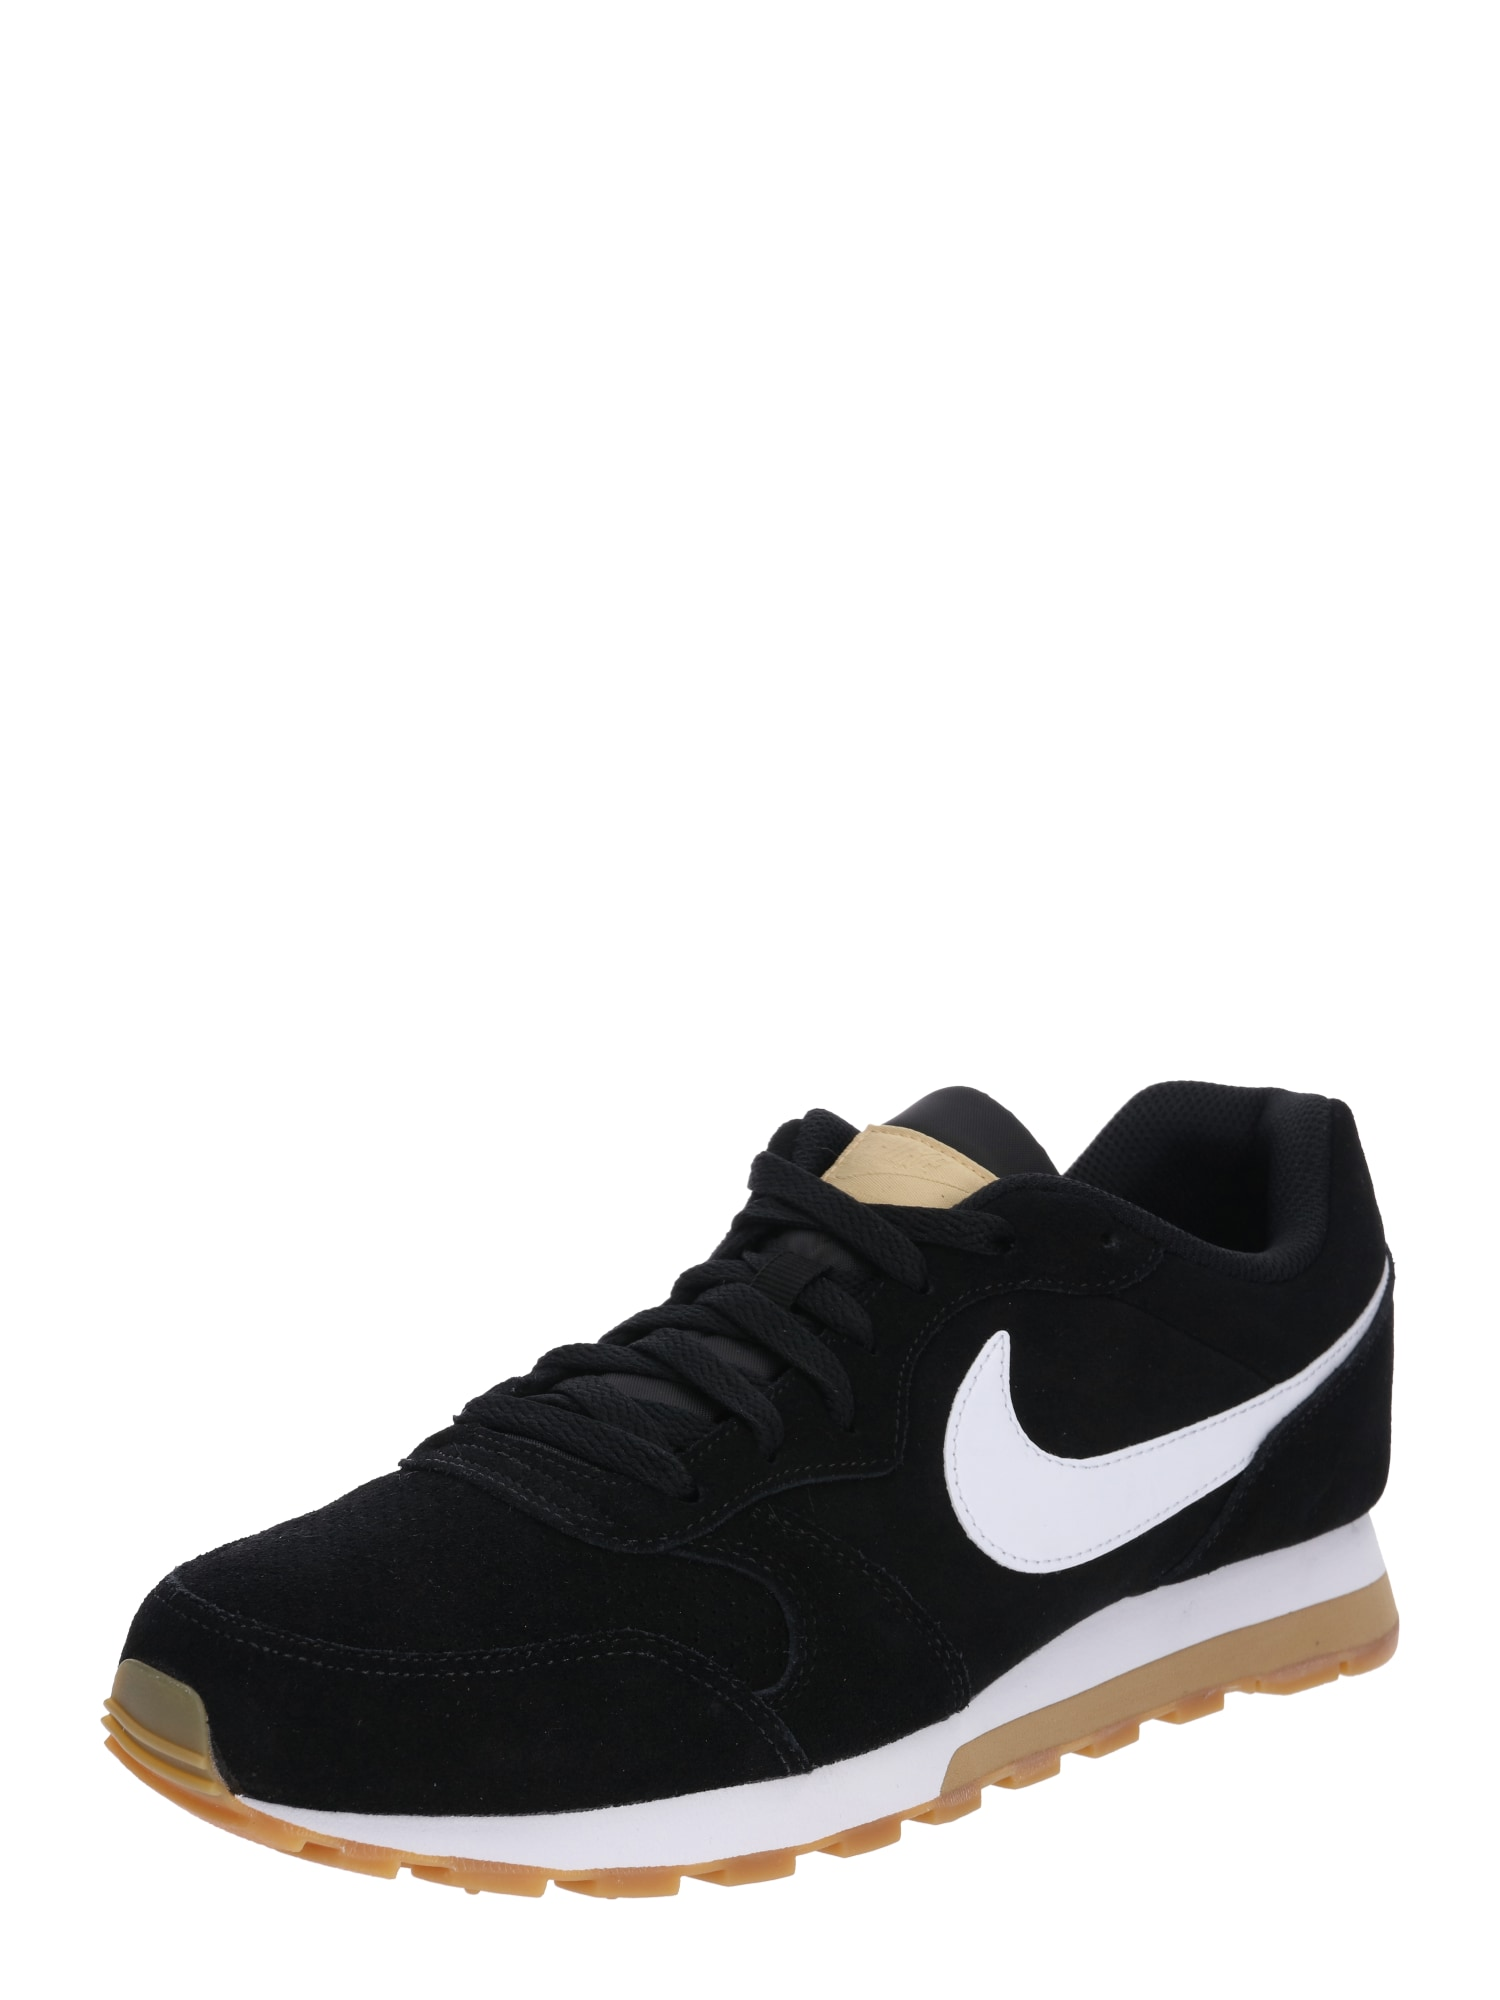 Tenisky MD Runner 2 Suede černá bílá Nike Sportswear